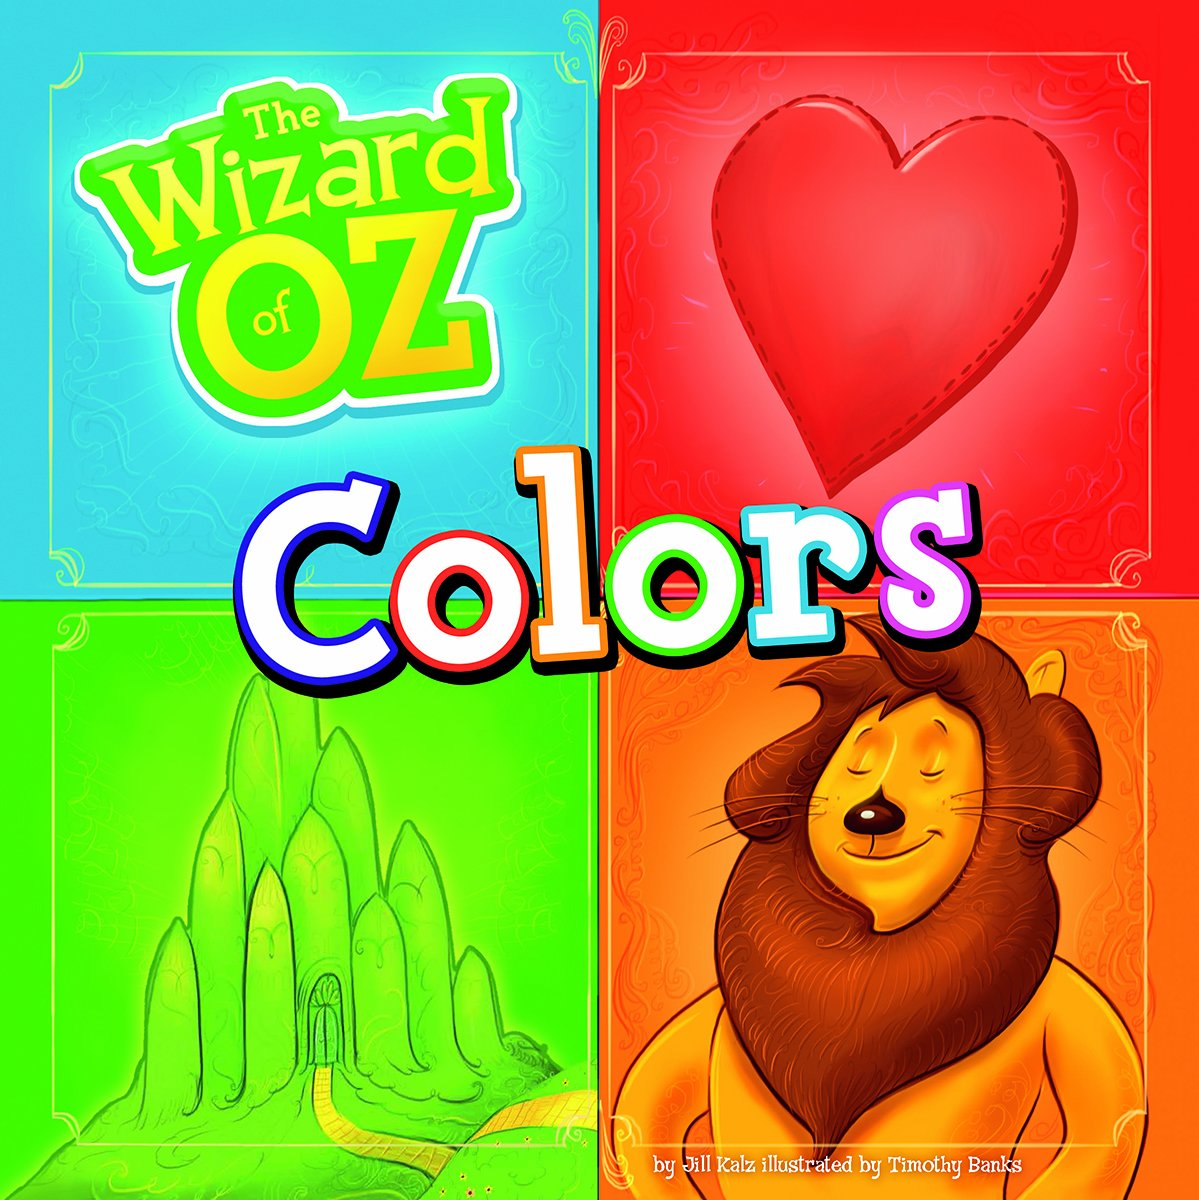 Amazon.com: The Wizard of Oz Colors (9781476537689): Jill Kalz ...